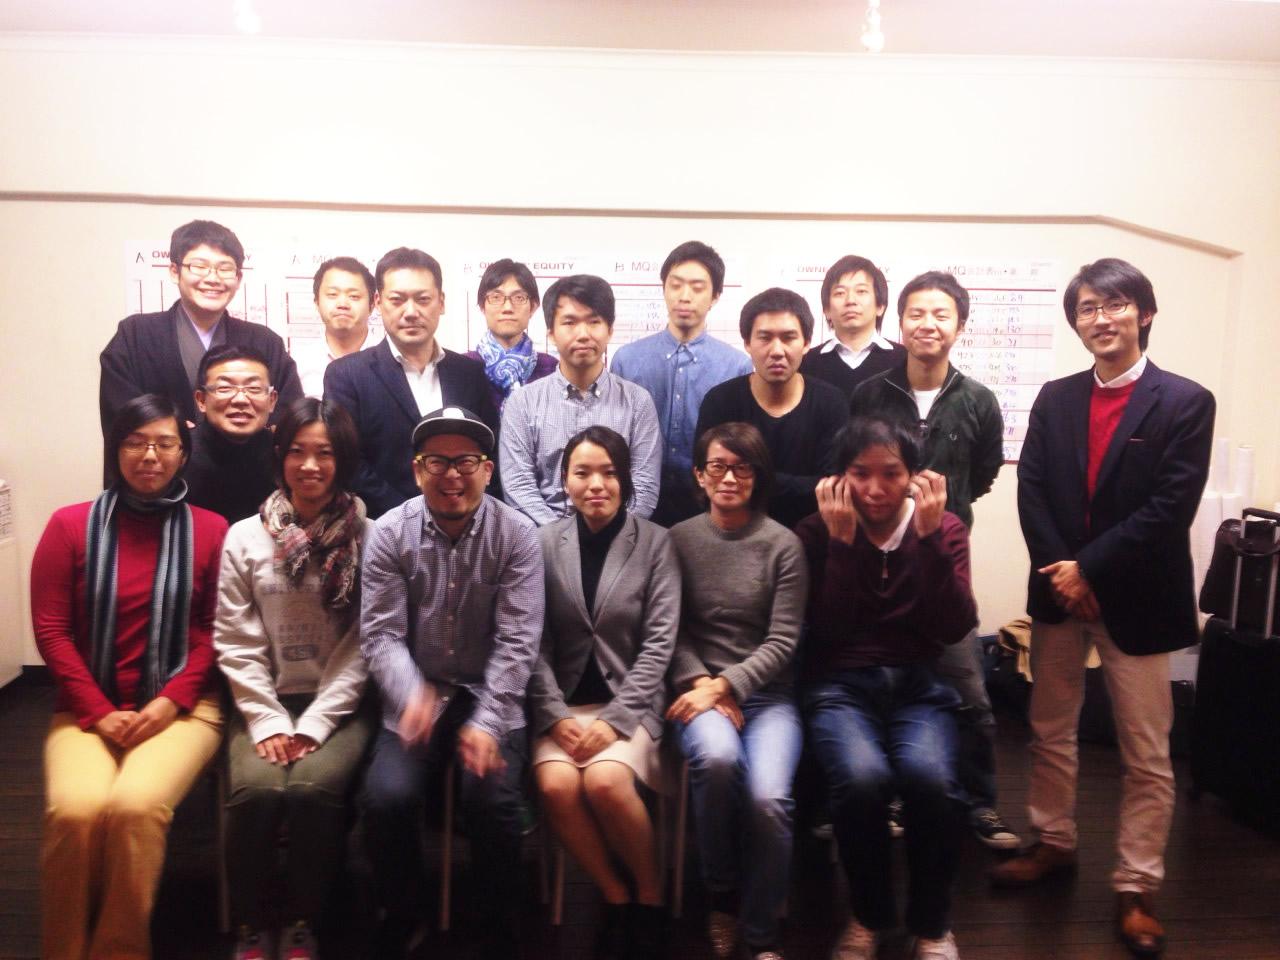 MG研修 マネジメントゲーム研修 20141115-16-03